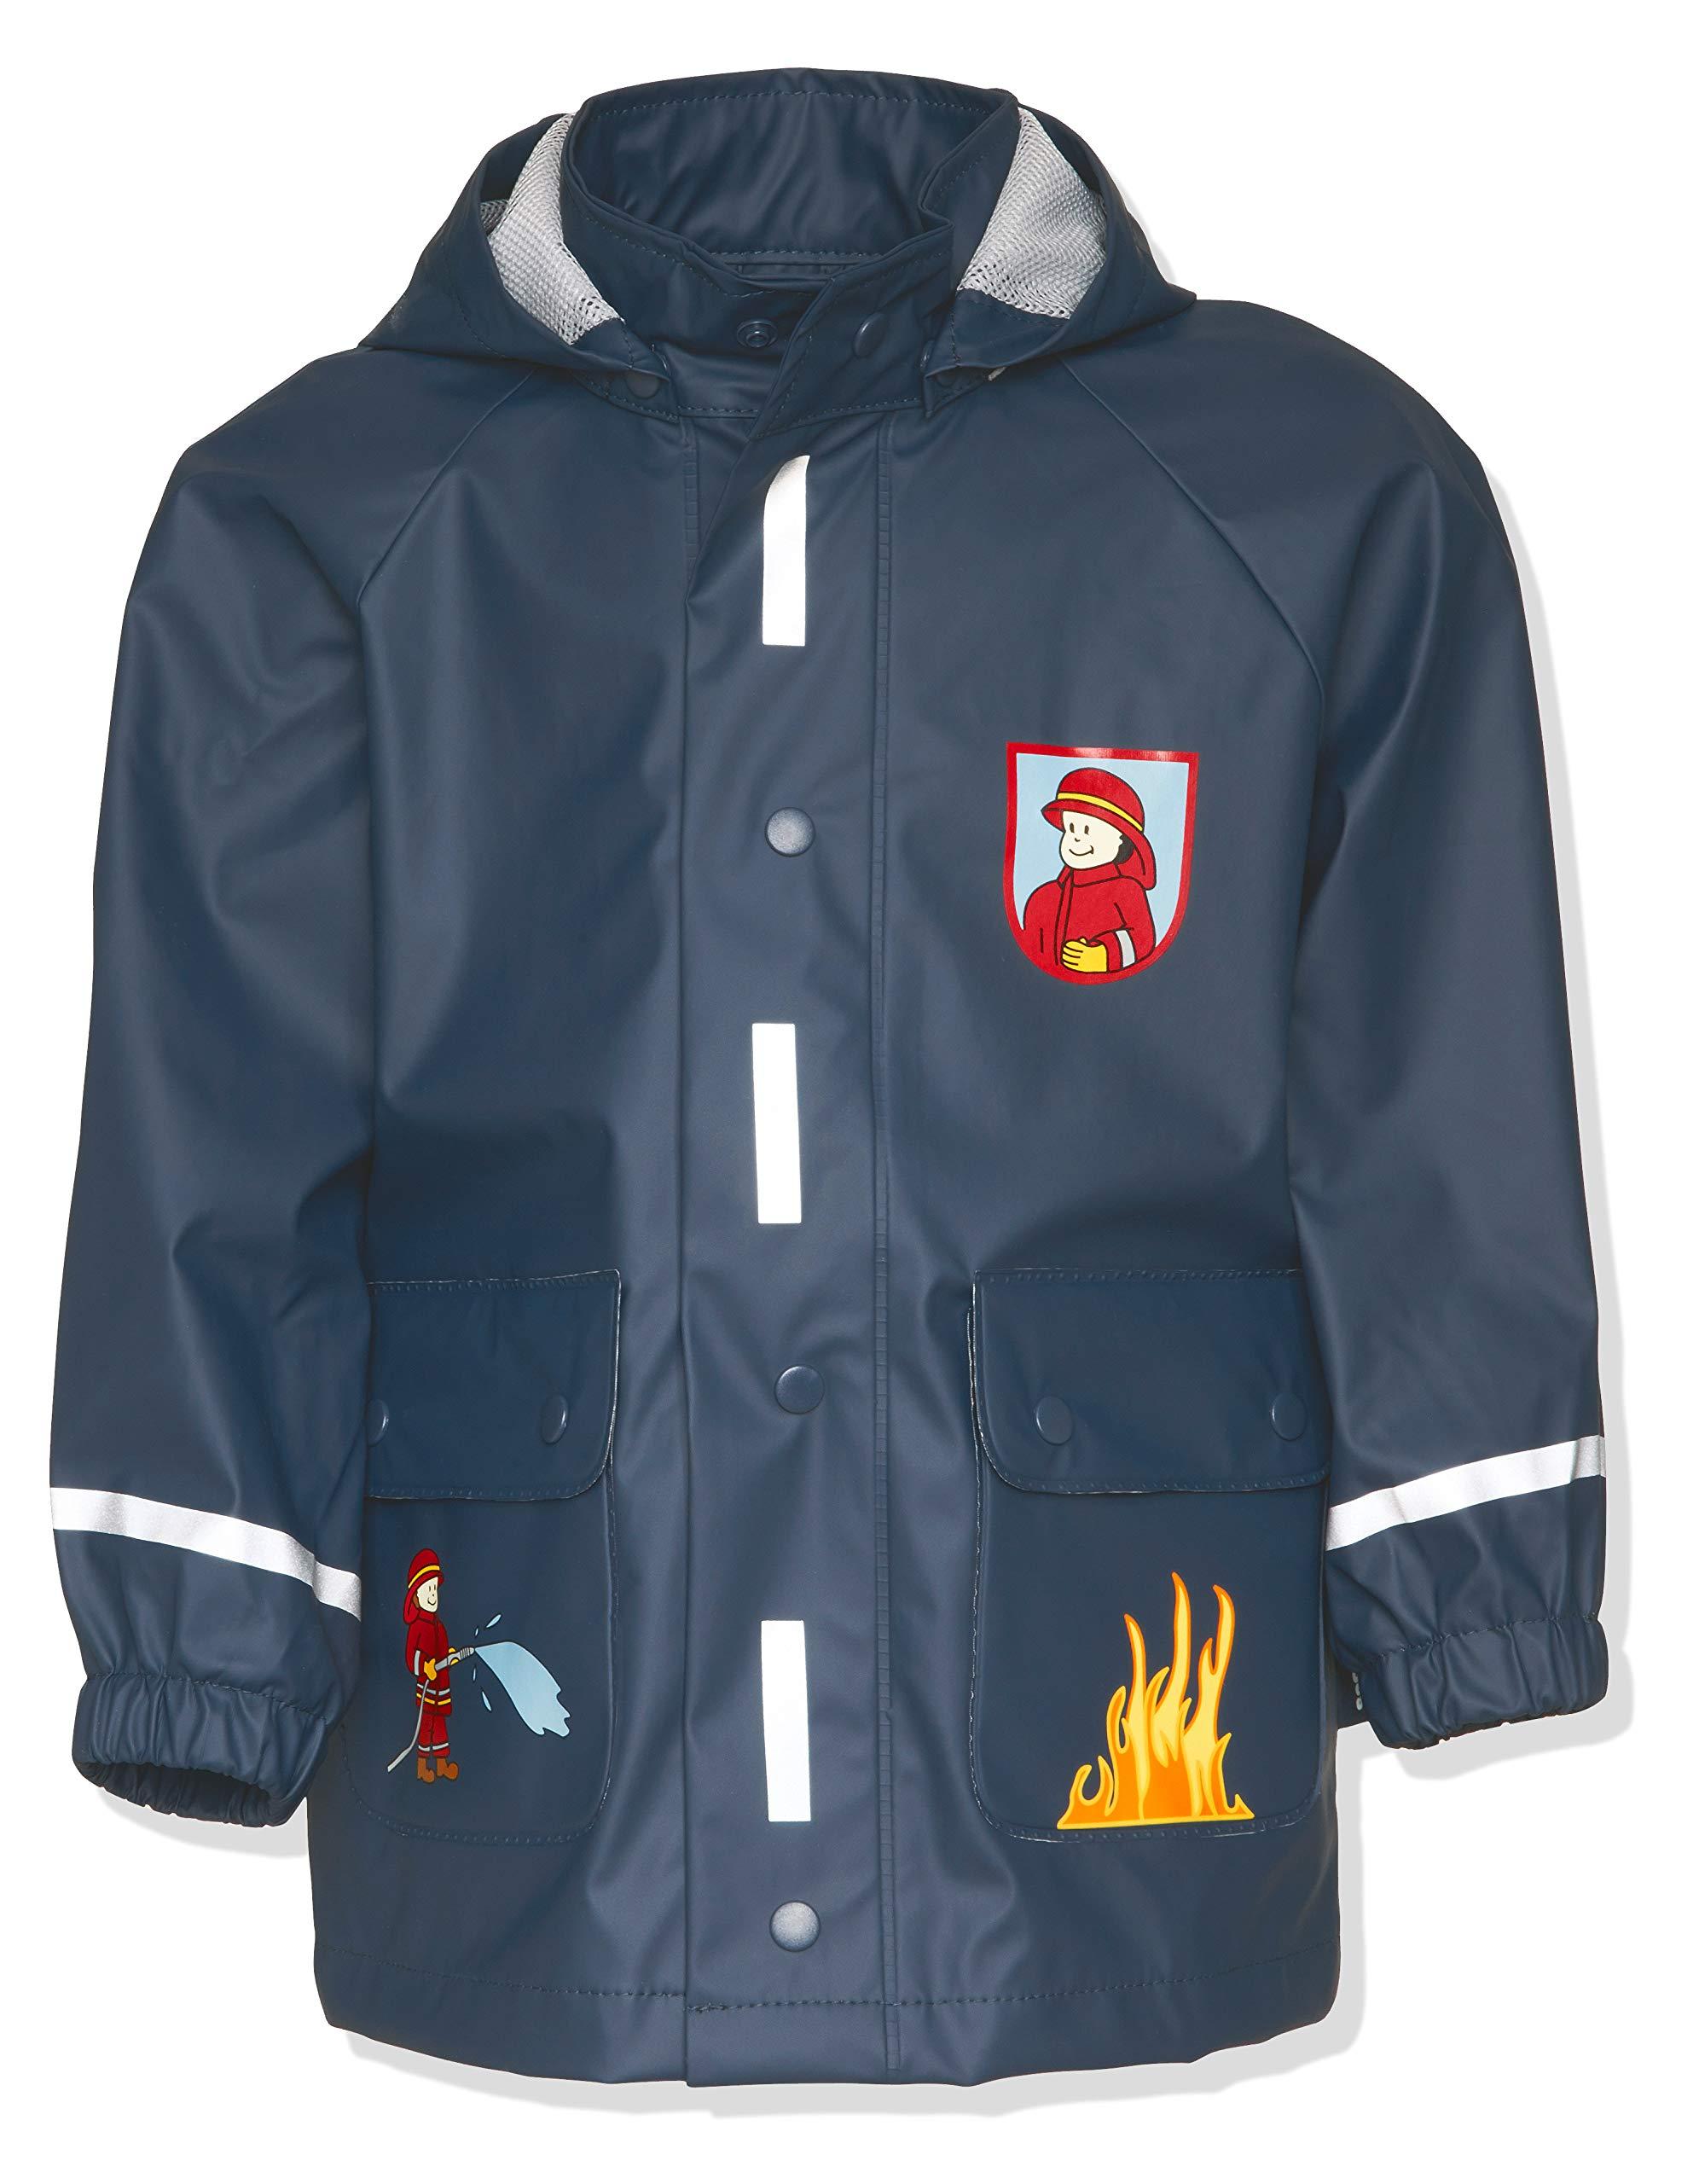 Playshoes Fireman Collection Waterproof Reflective Rain Jacket (3-4 Years)